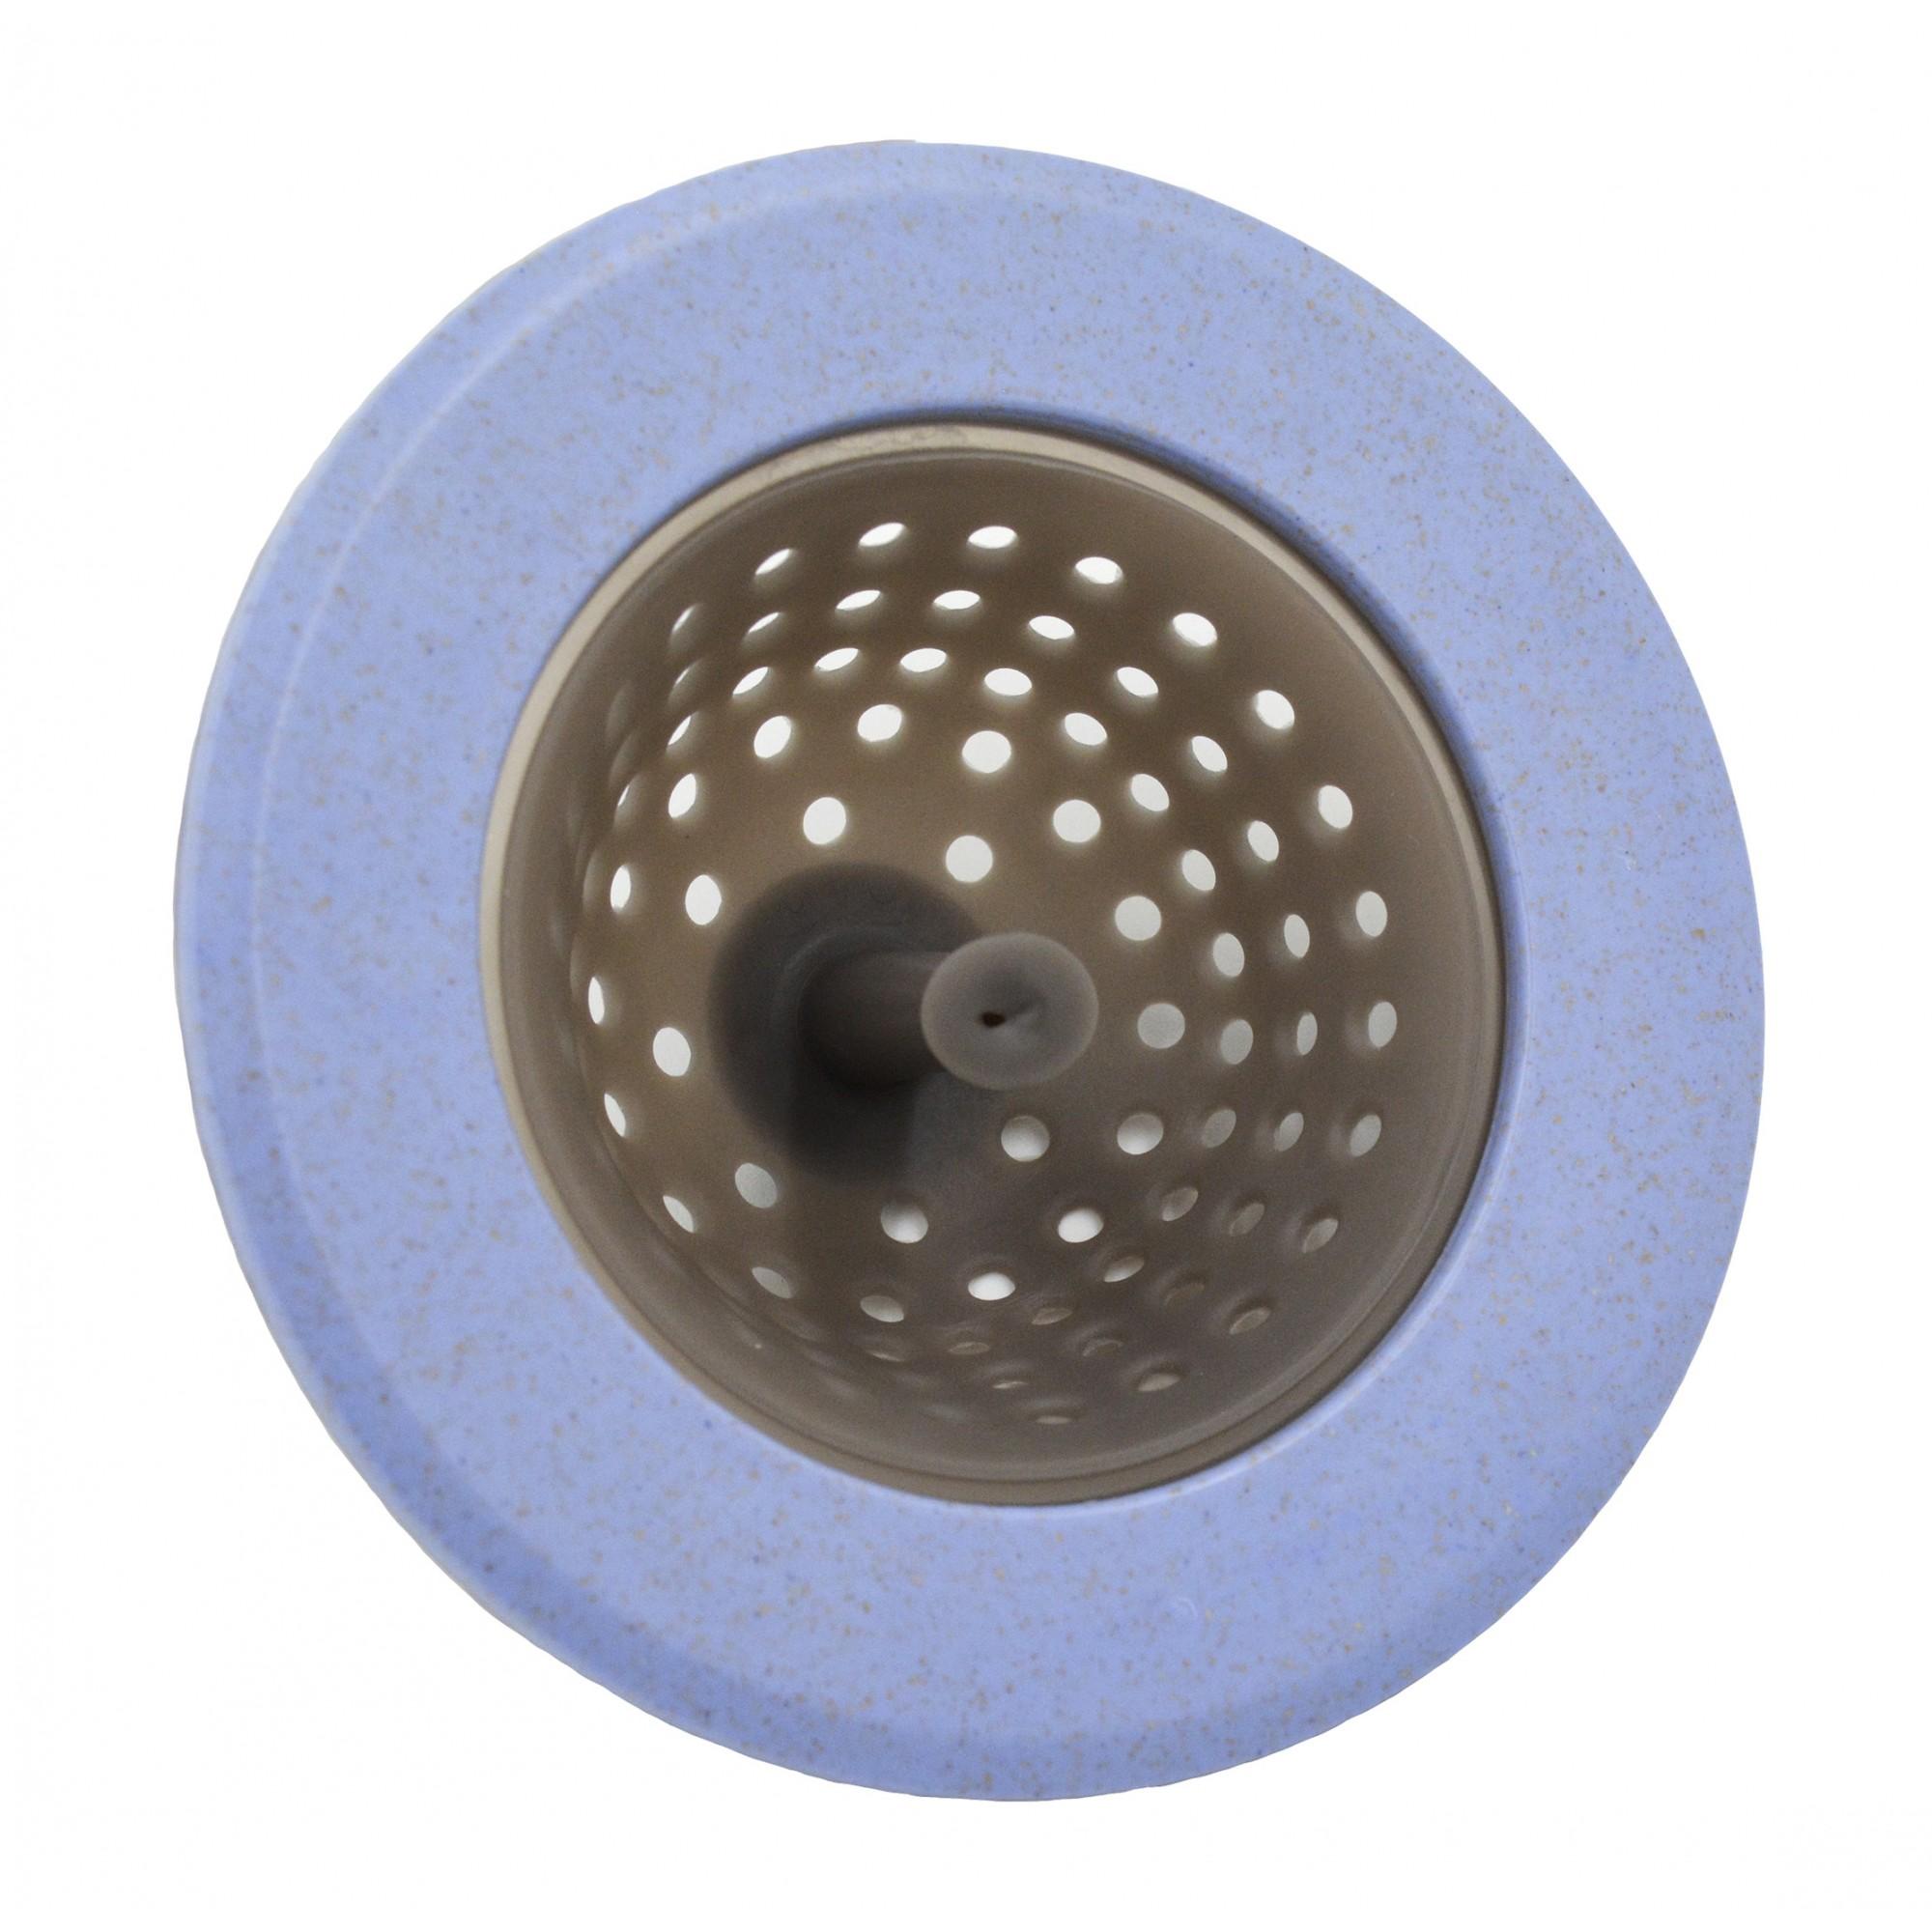 Сеточка для сбора мусора, силикон, пластик ANGO голубая ANGO